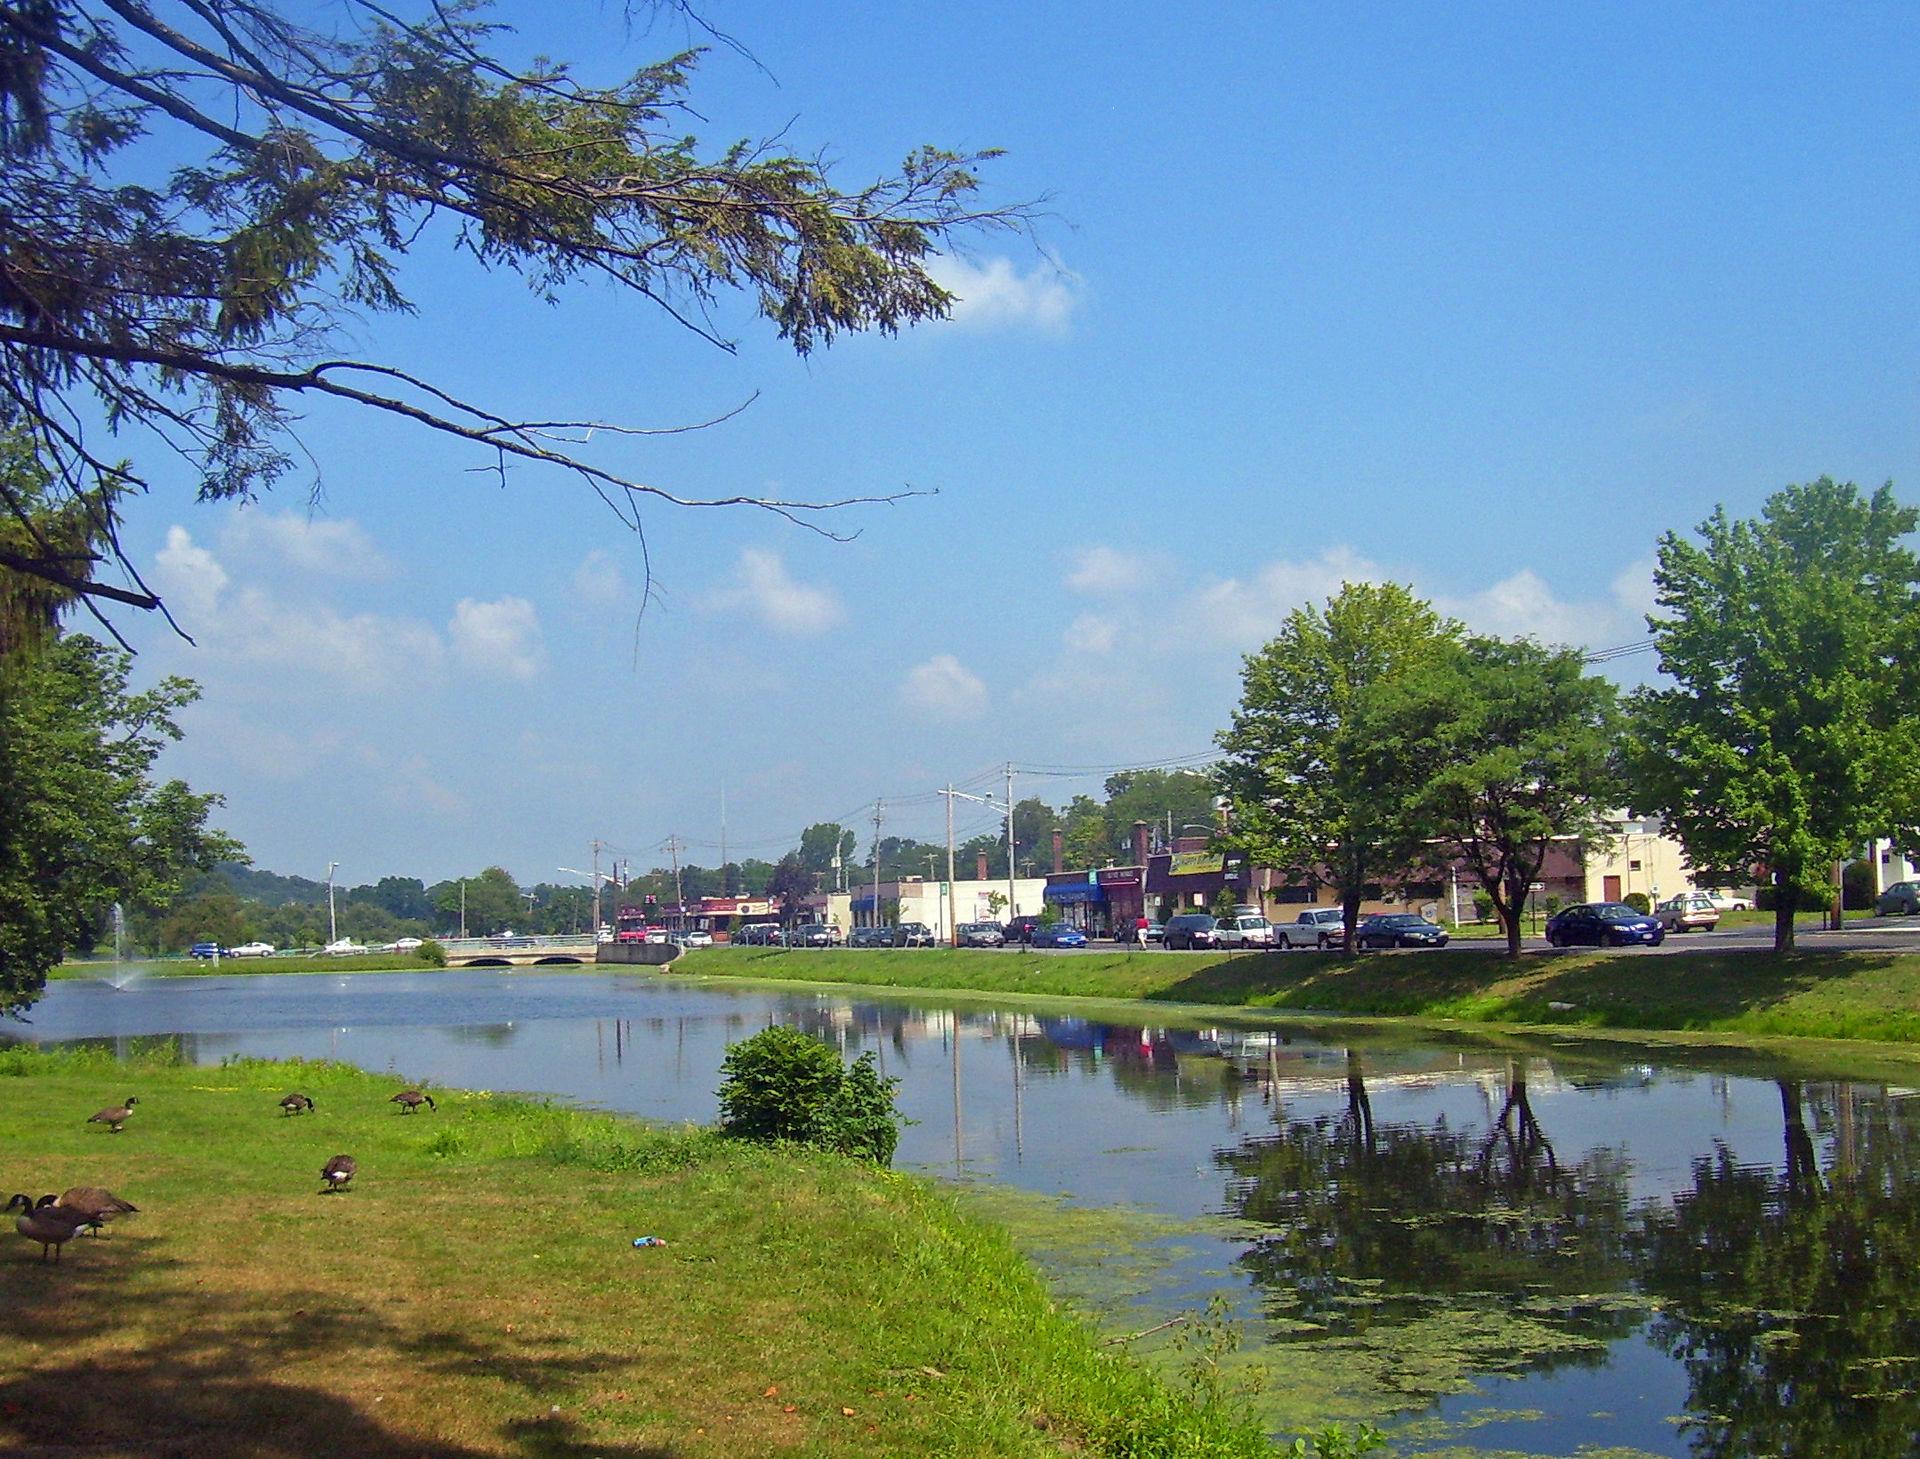 Village of monroe ny dating